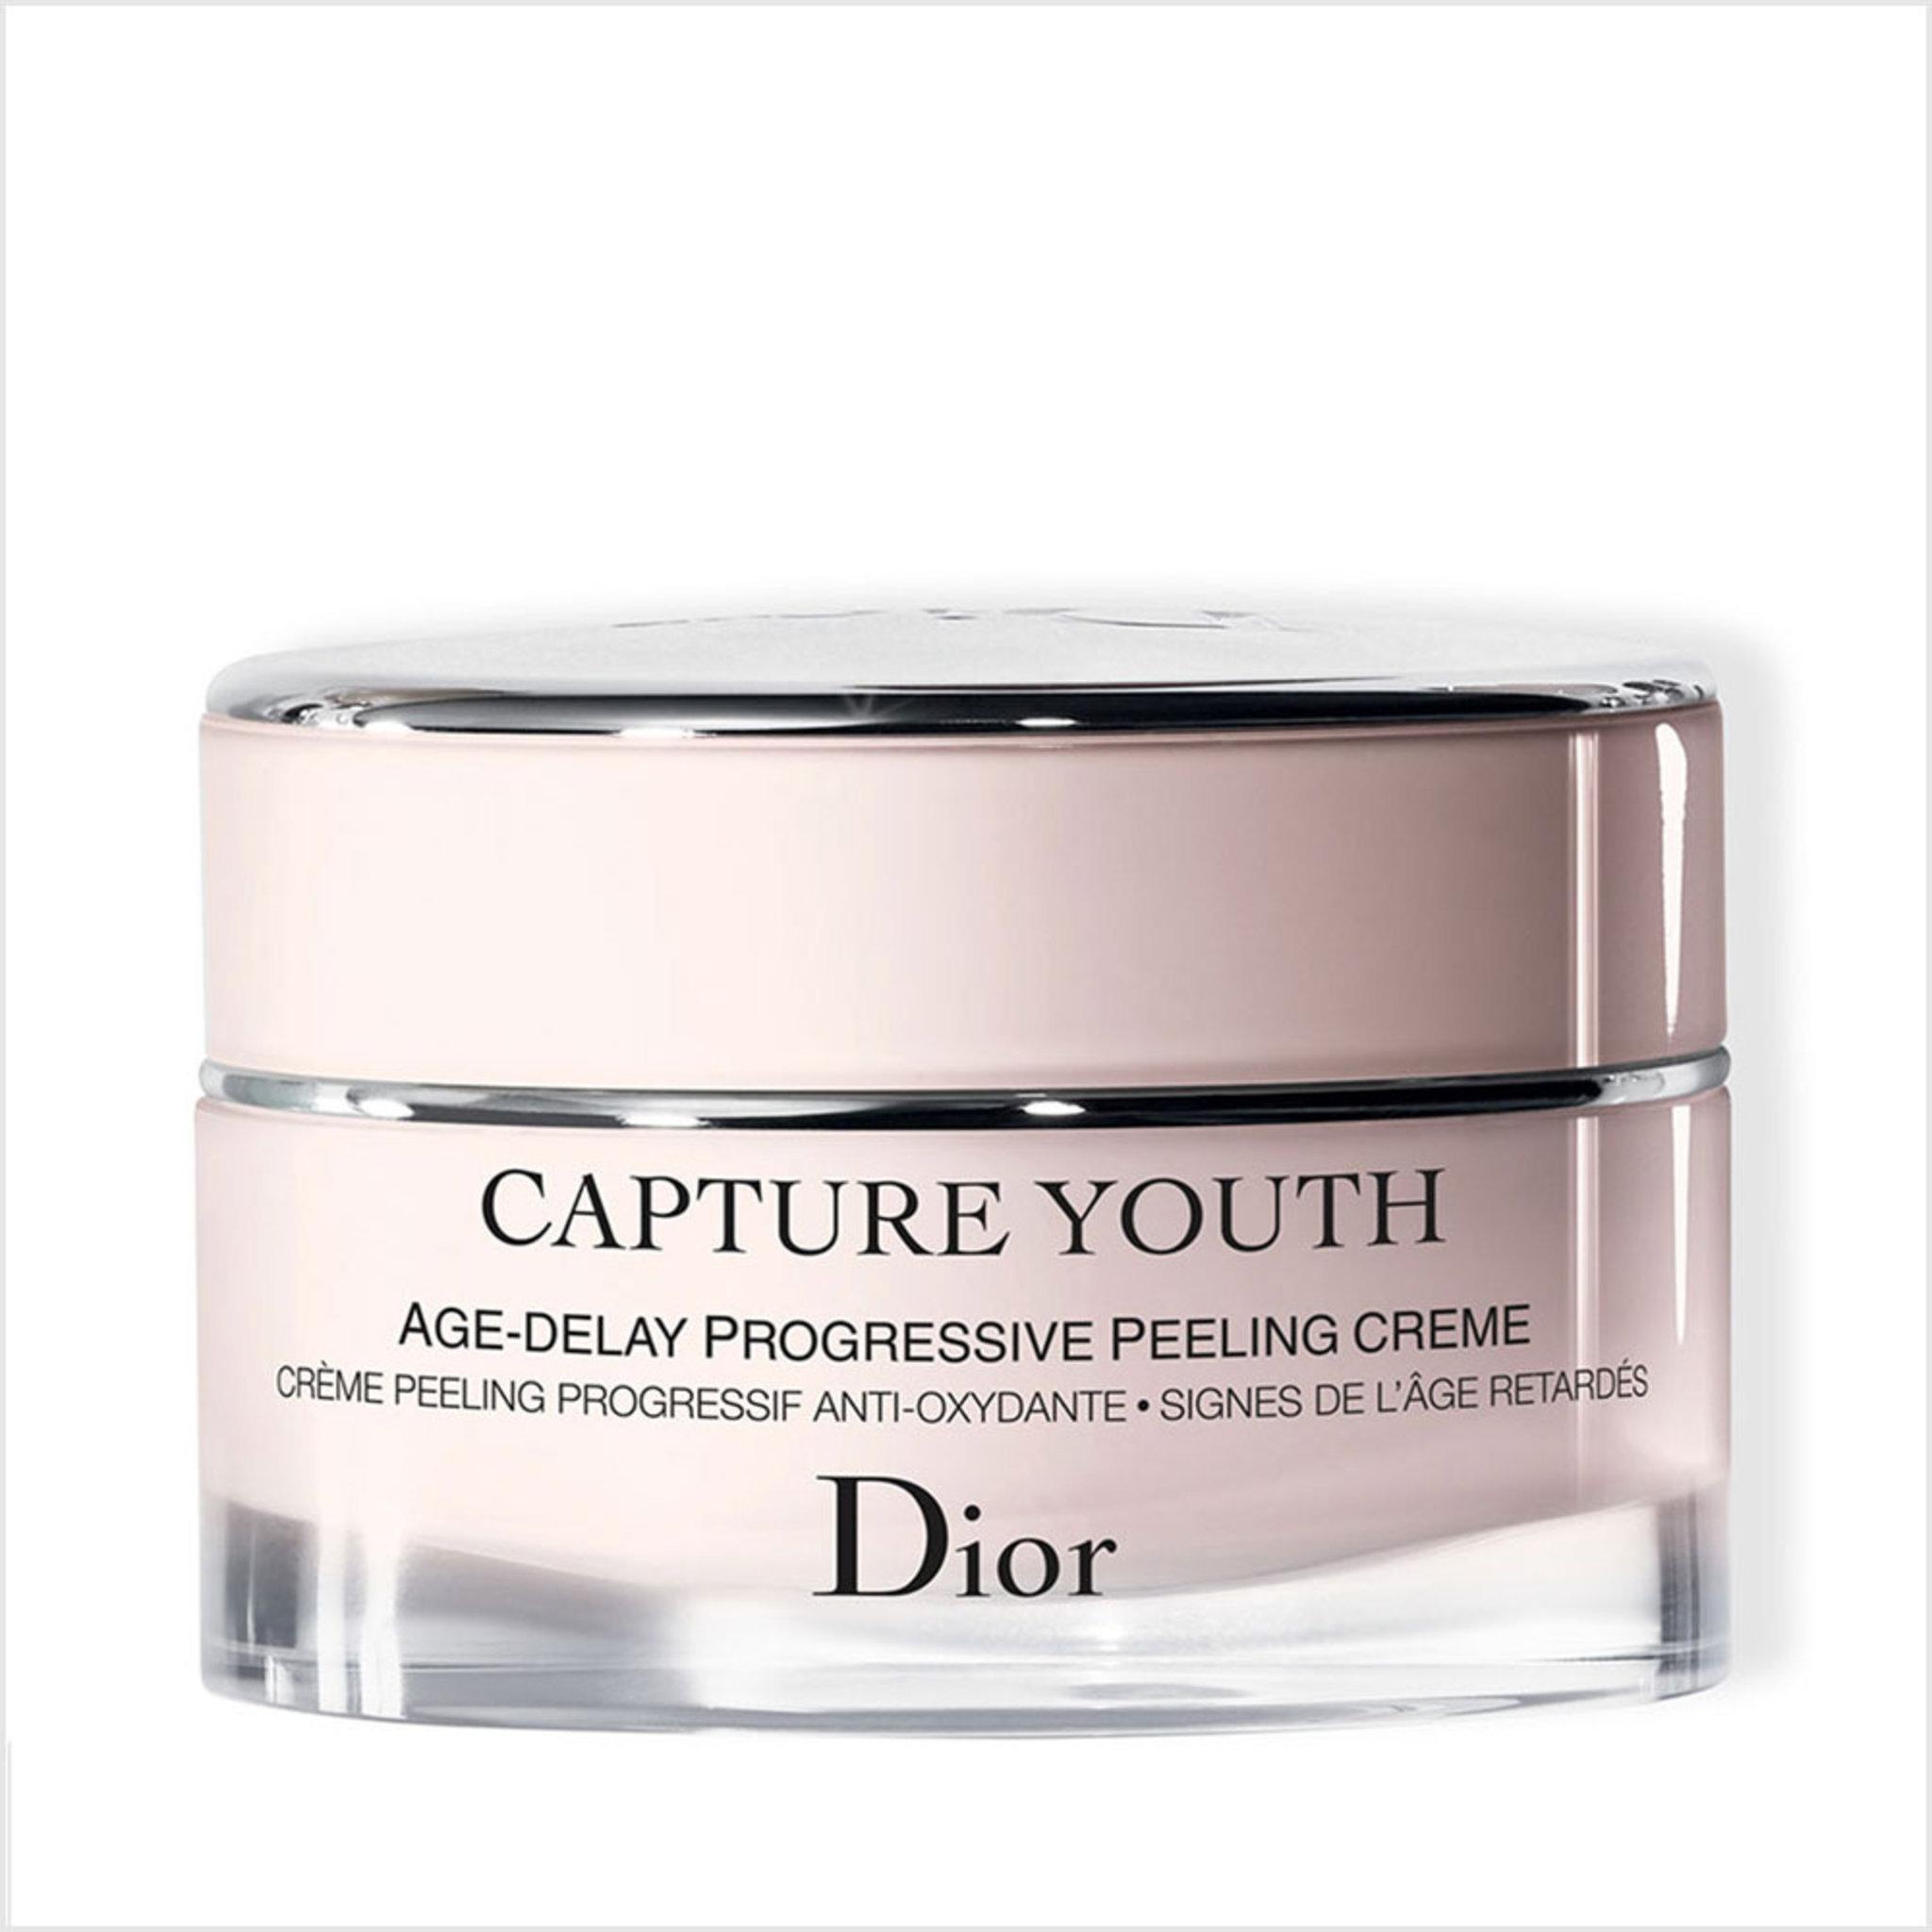 Capture Youth Peeling Cream, 50 ML